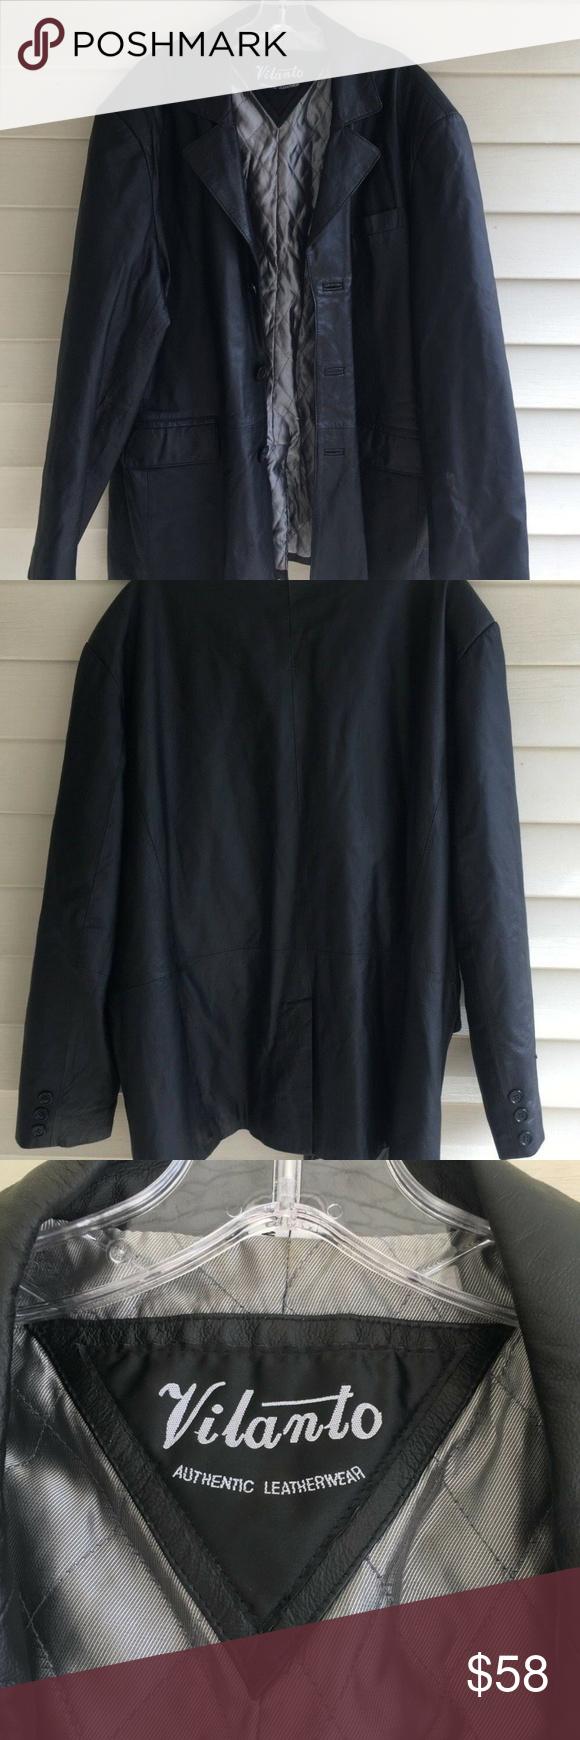 Vilanto Mens Authentic Leather Coat 2xl In 2020 Leather Coat Authentic Leather Clothes Design [ 1740 x 580 Pixel ]